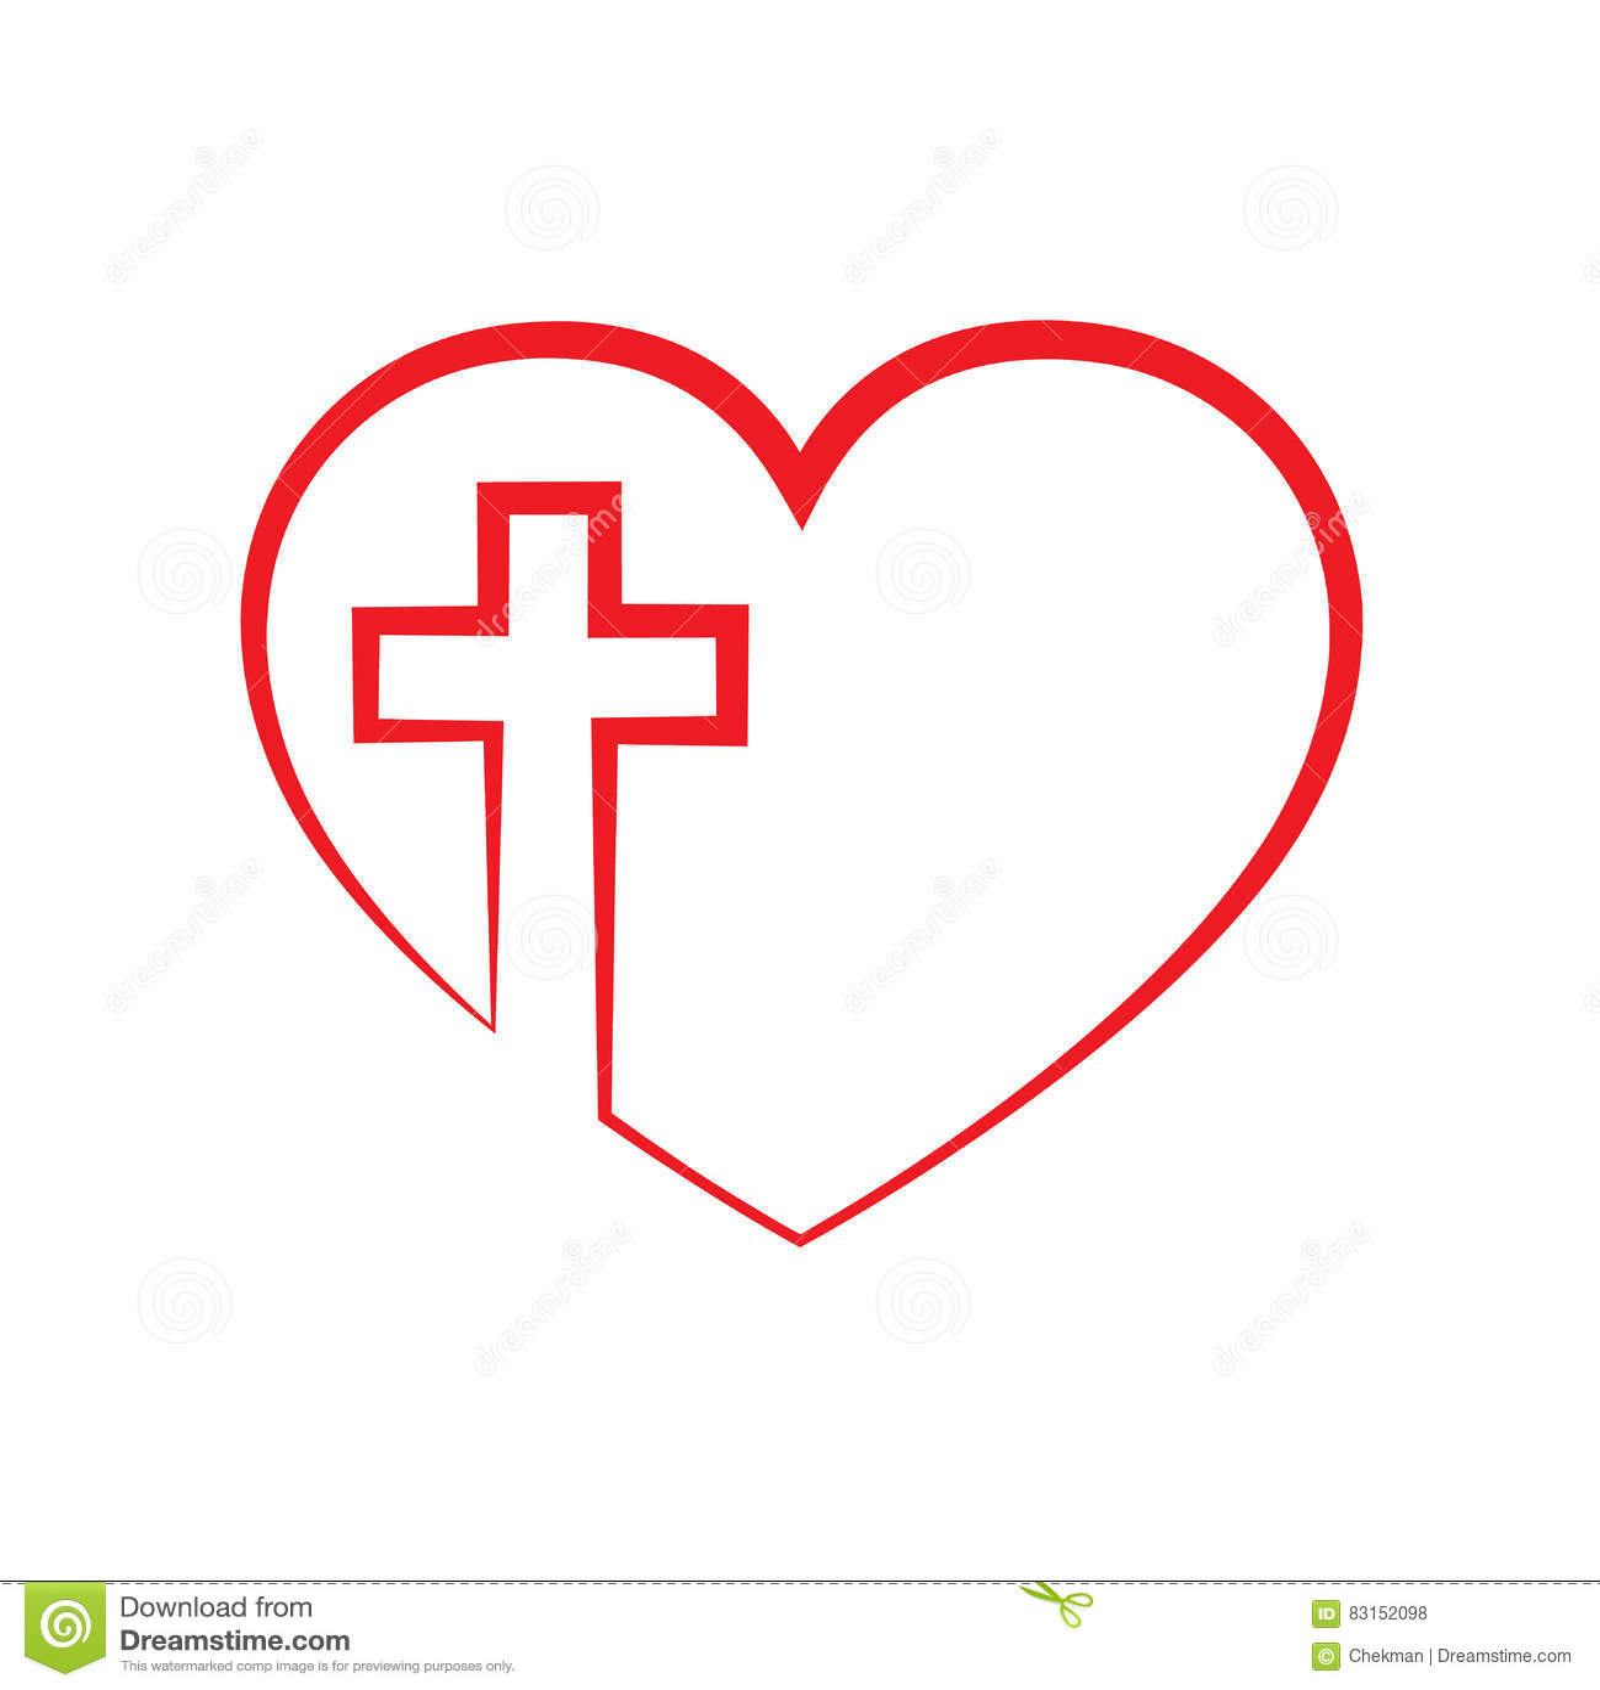 heart with christian cross inside vector illustration